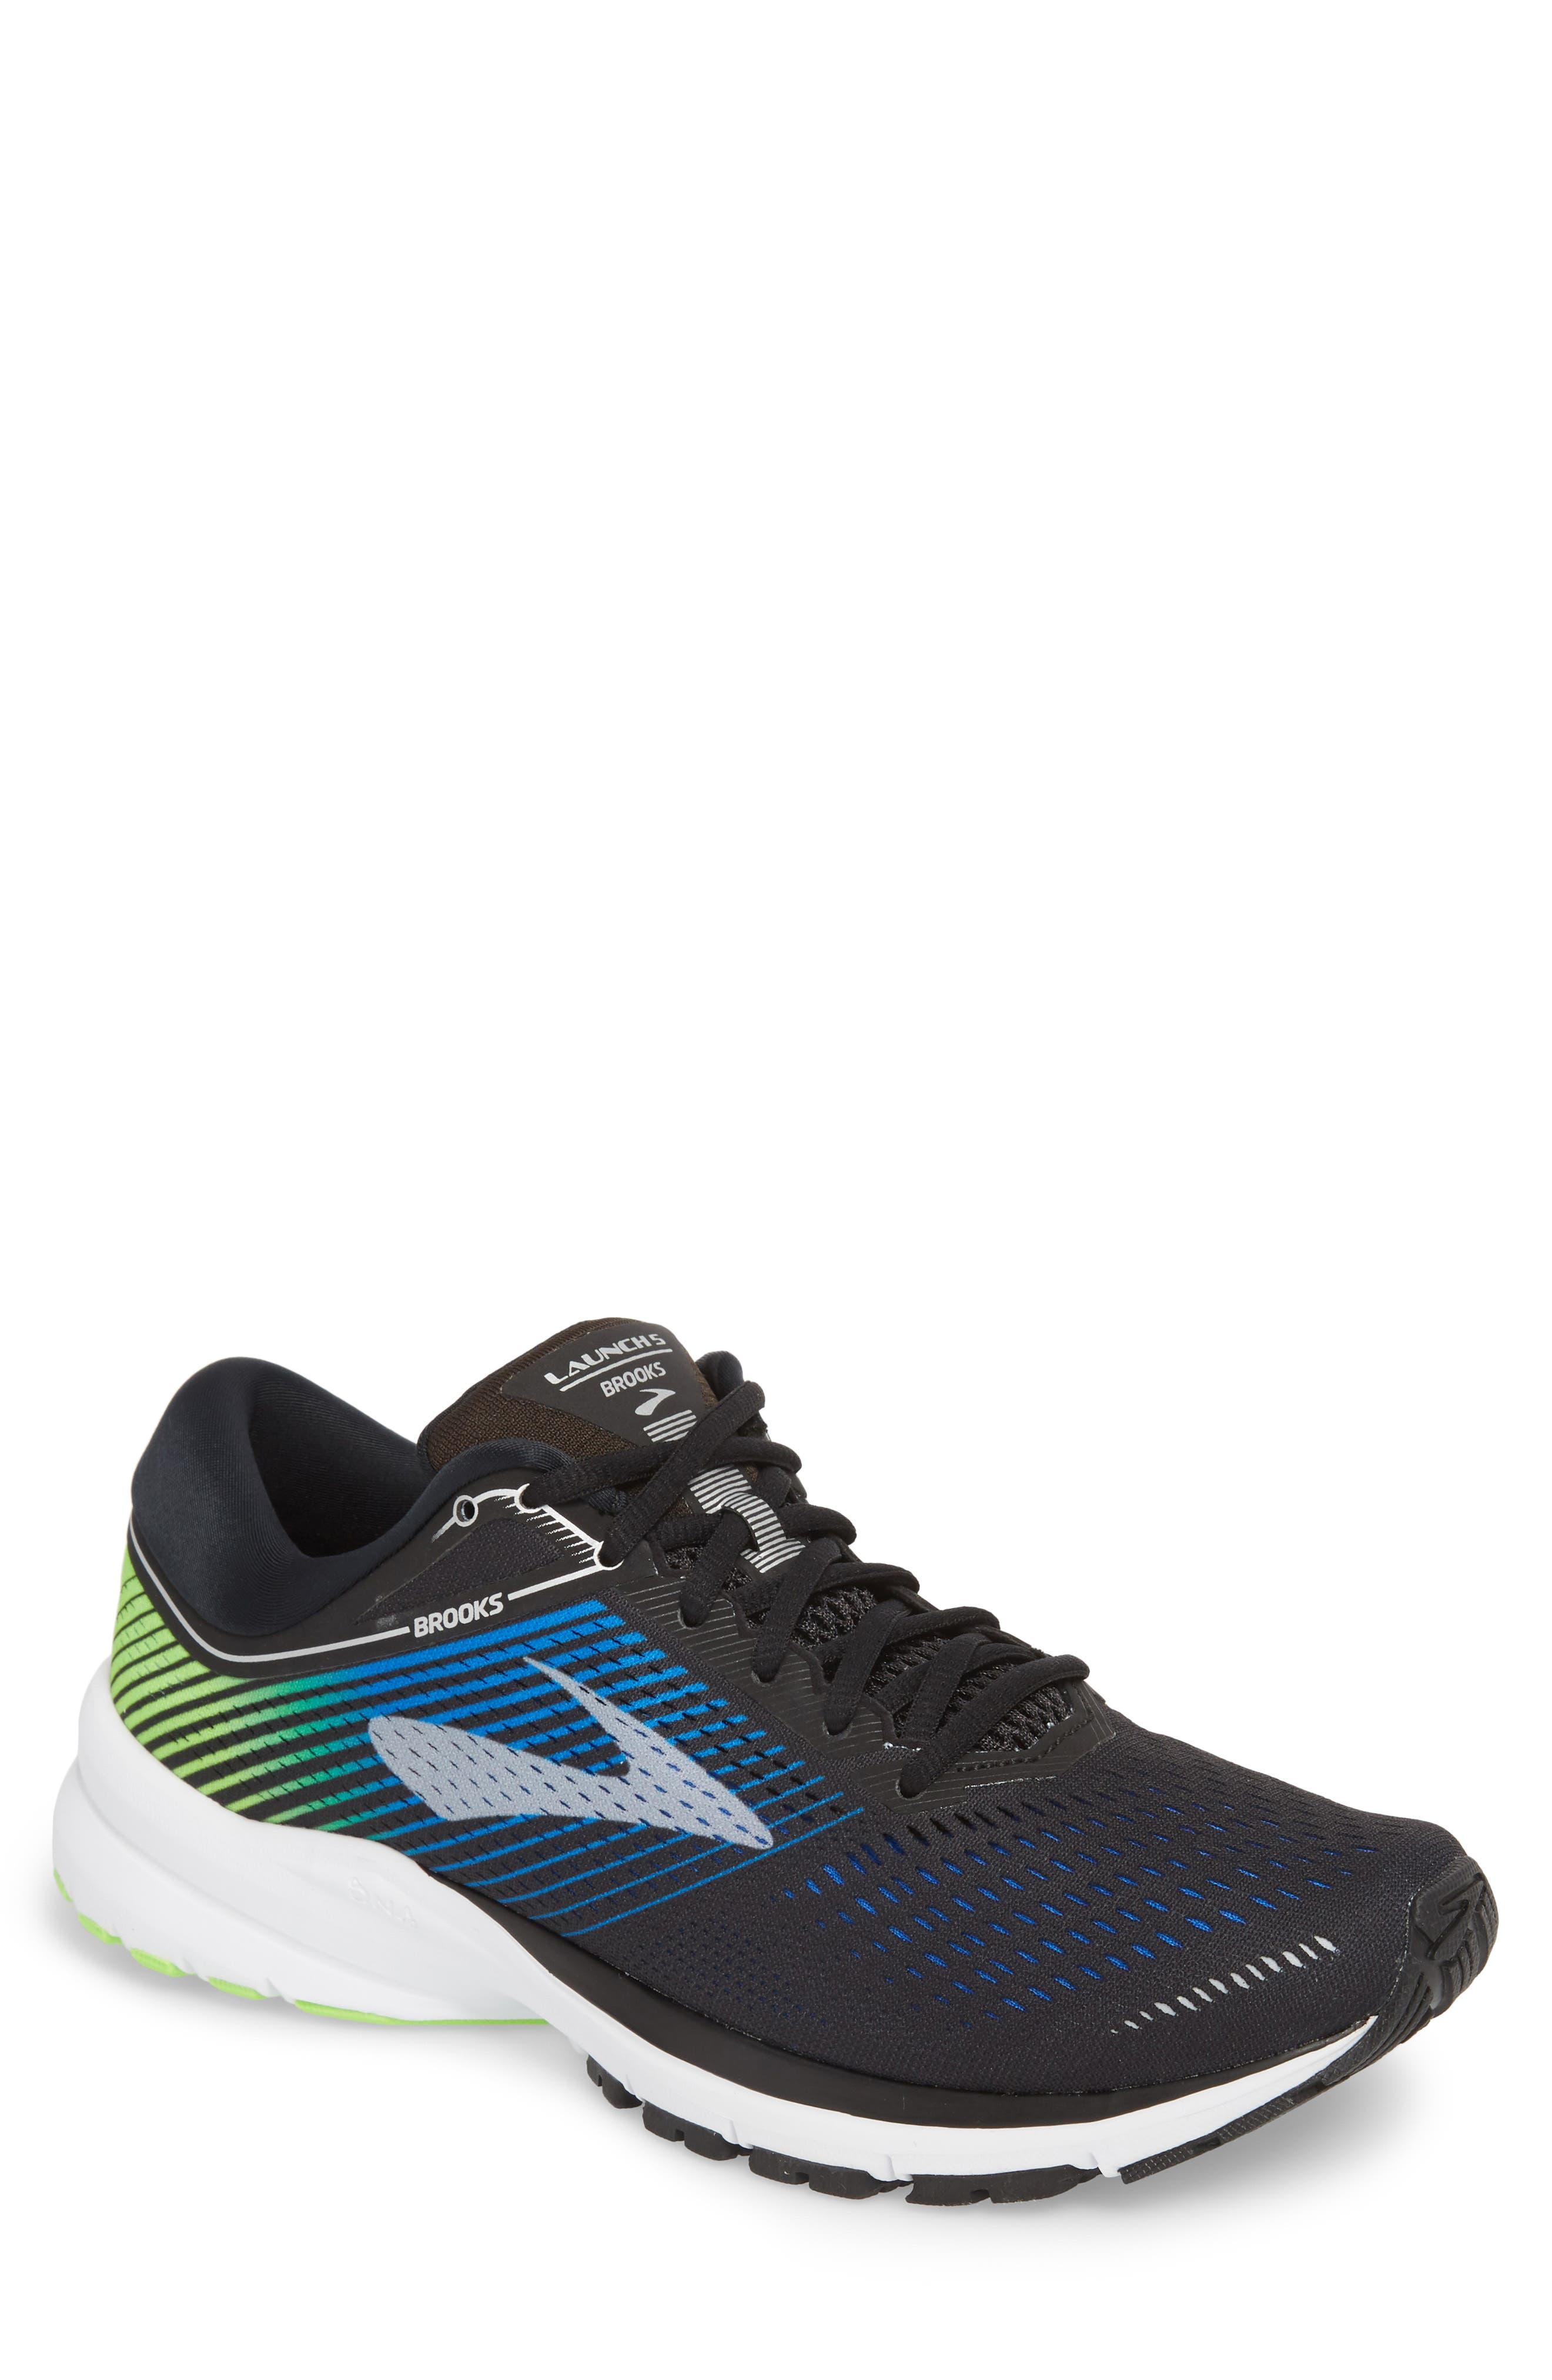 Launch 5 Running Shoe,                             Main thumbnail 1, color,                             Black/ Blue/ Green